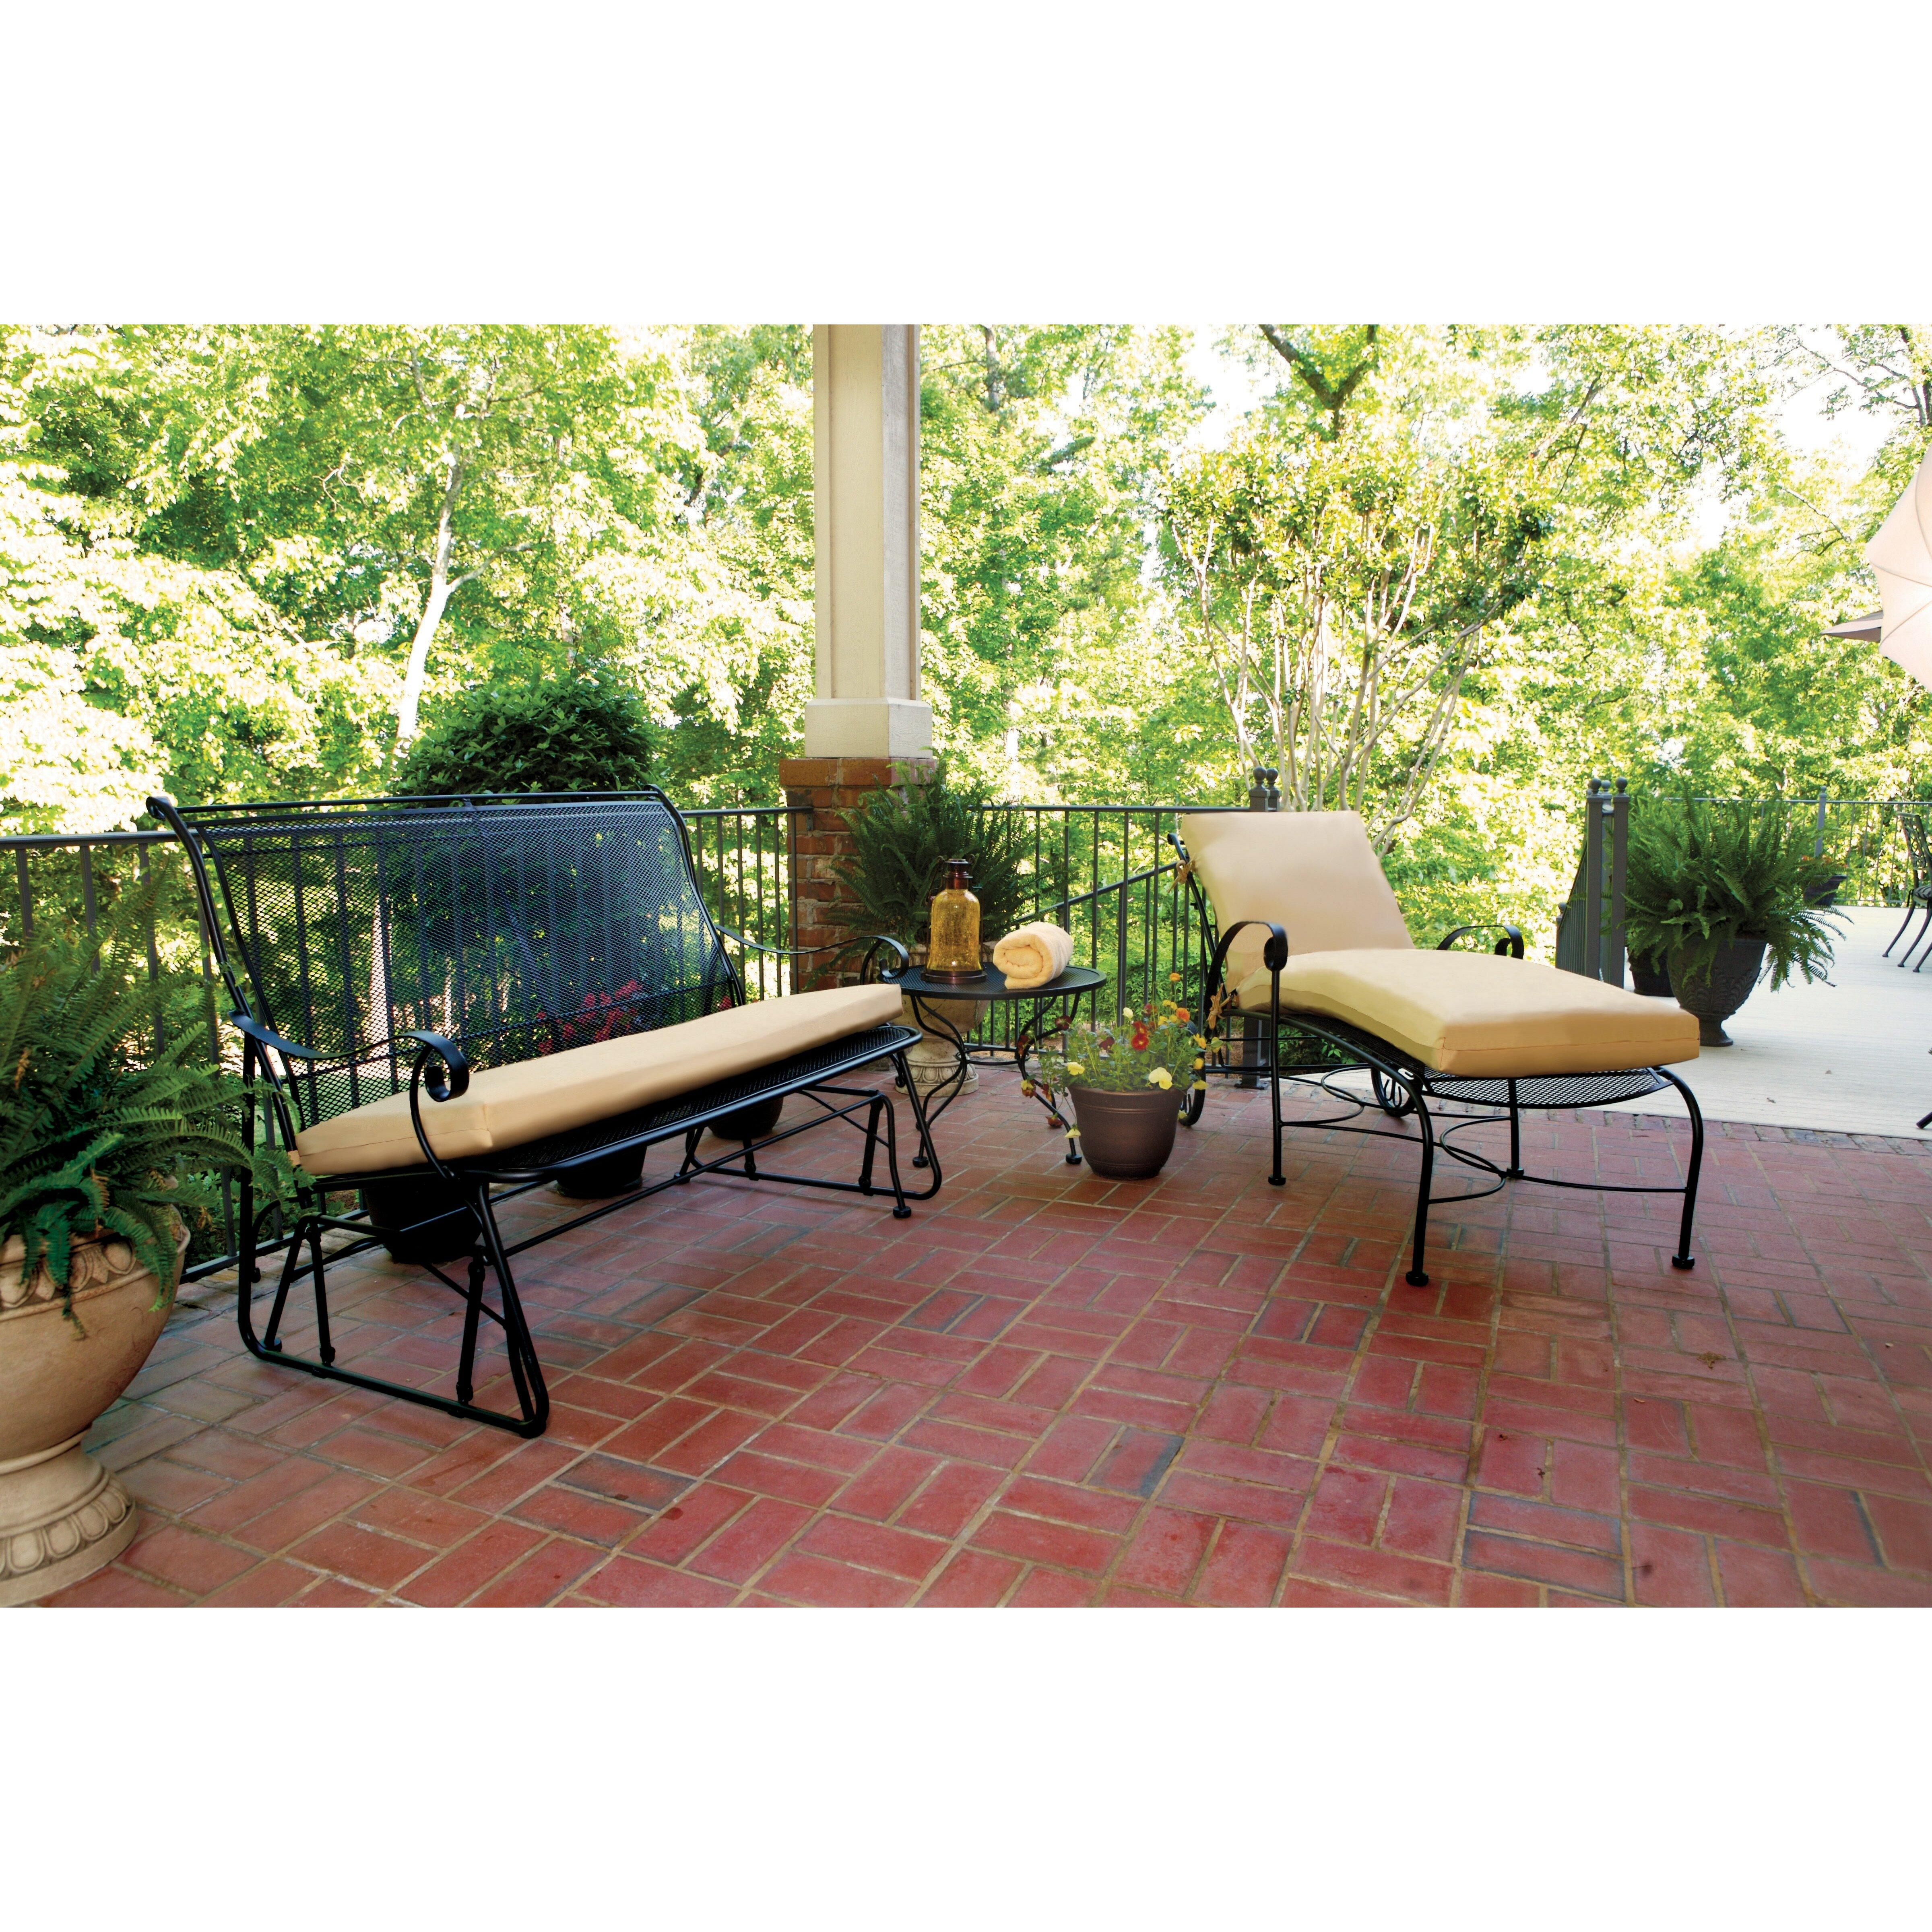 shipping alexandria balcony patio set alexandria balcony set high quality patio furniture